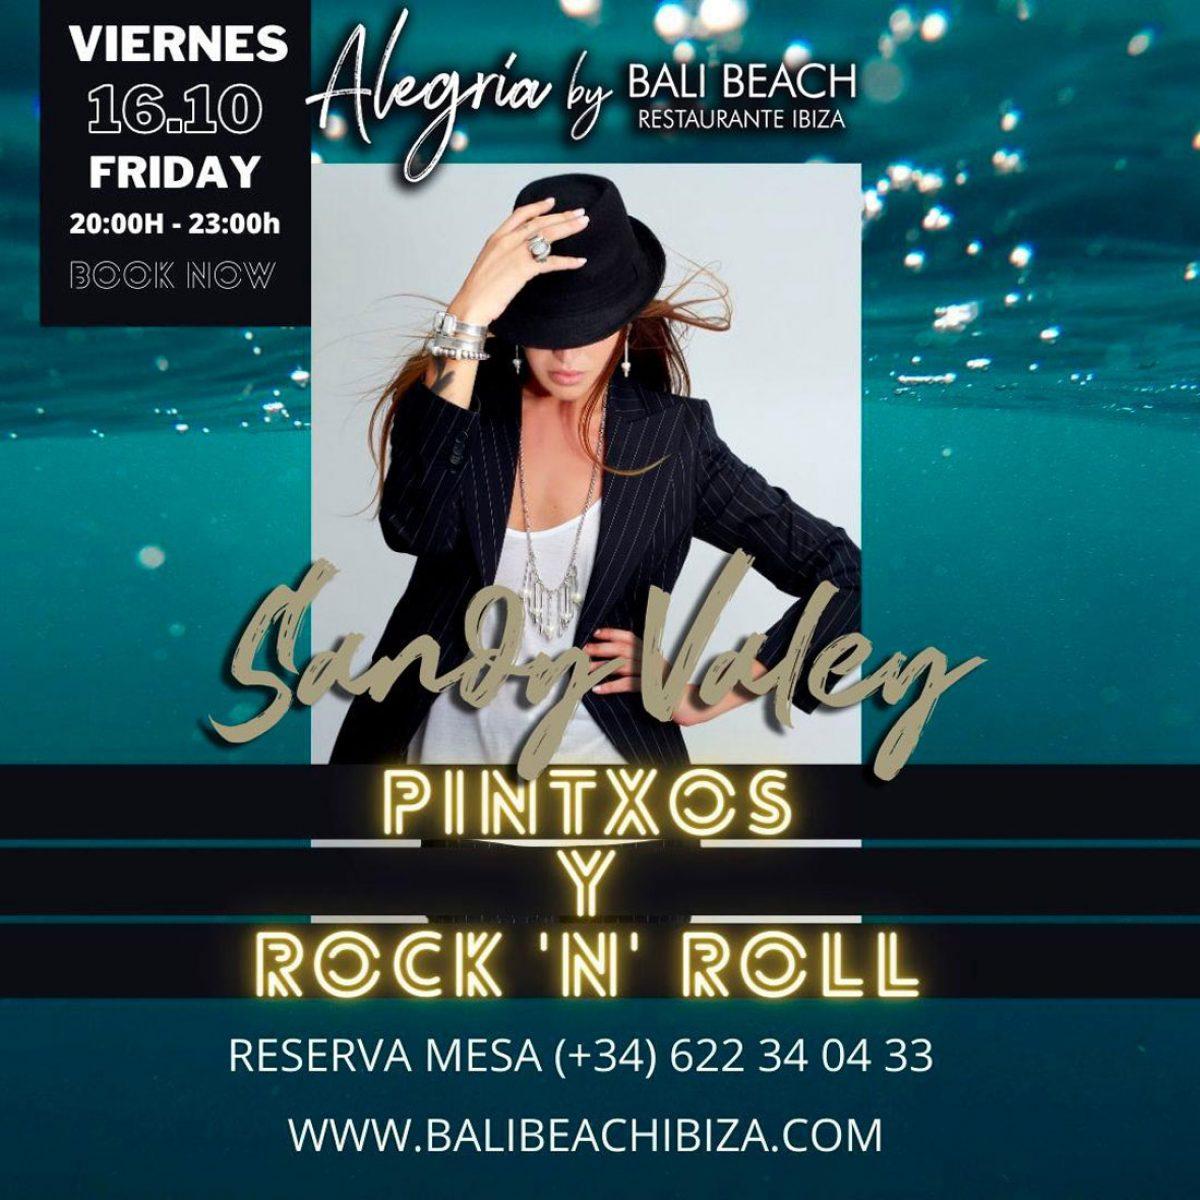 pintxos-and-rock-and-roll-bali-beach-ibiza-2020-welcometoibiza